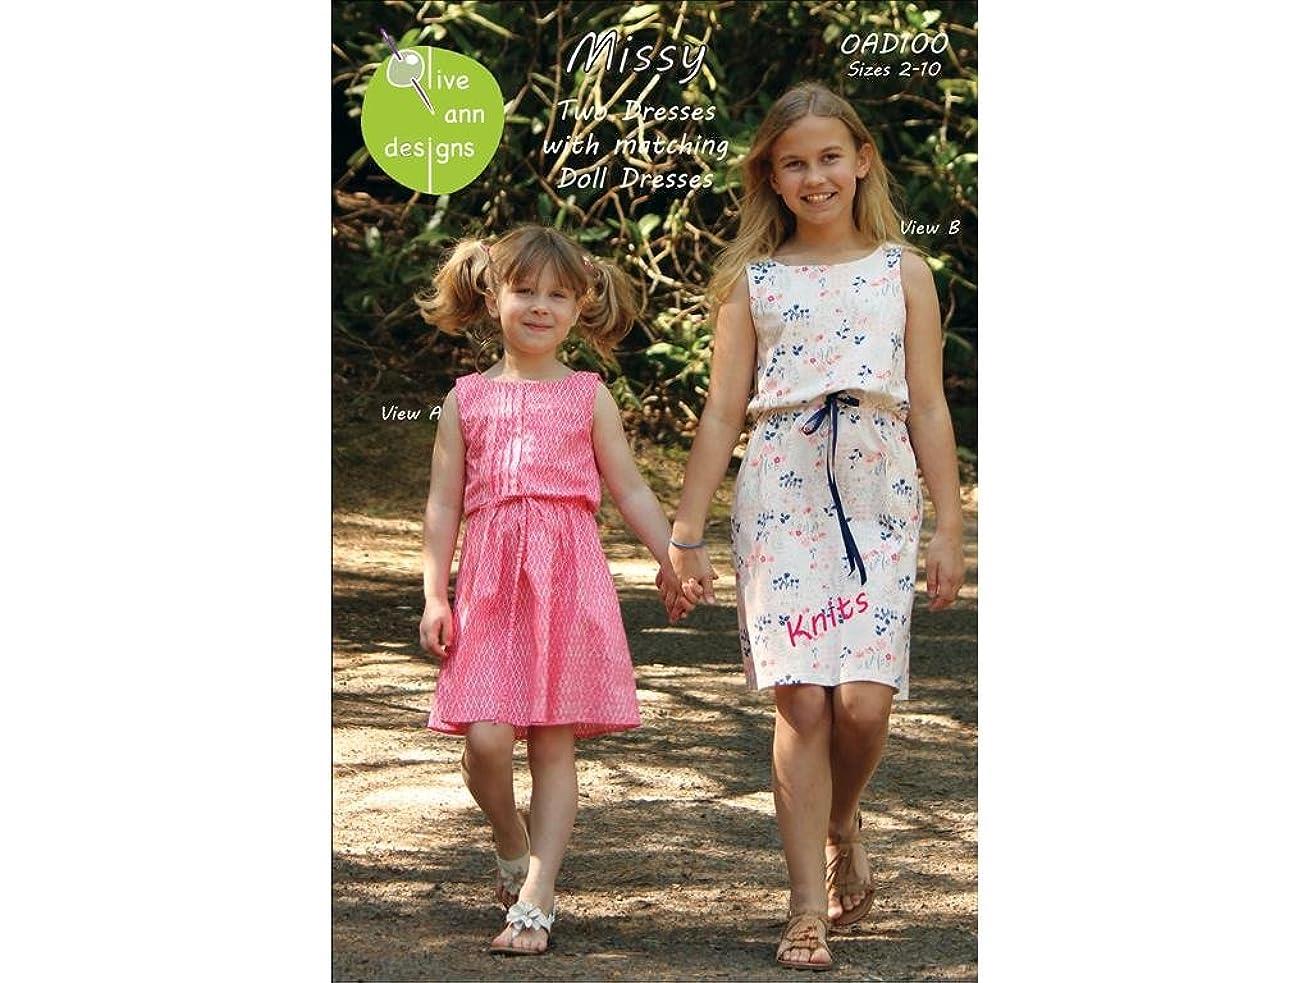 Olive Ann Designs Olive Ann Missy Size 2-10 Dress Pattern